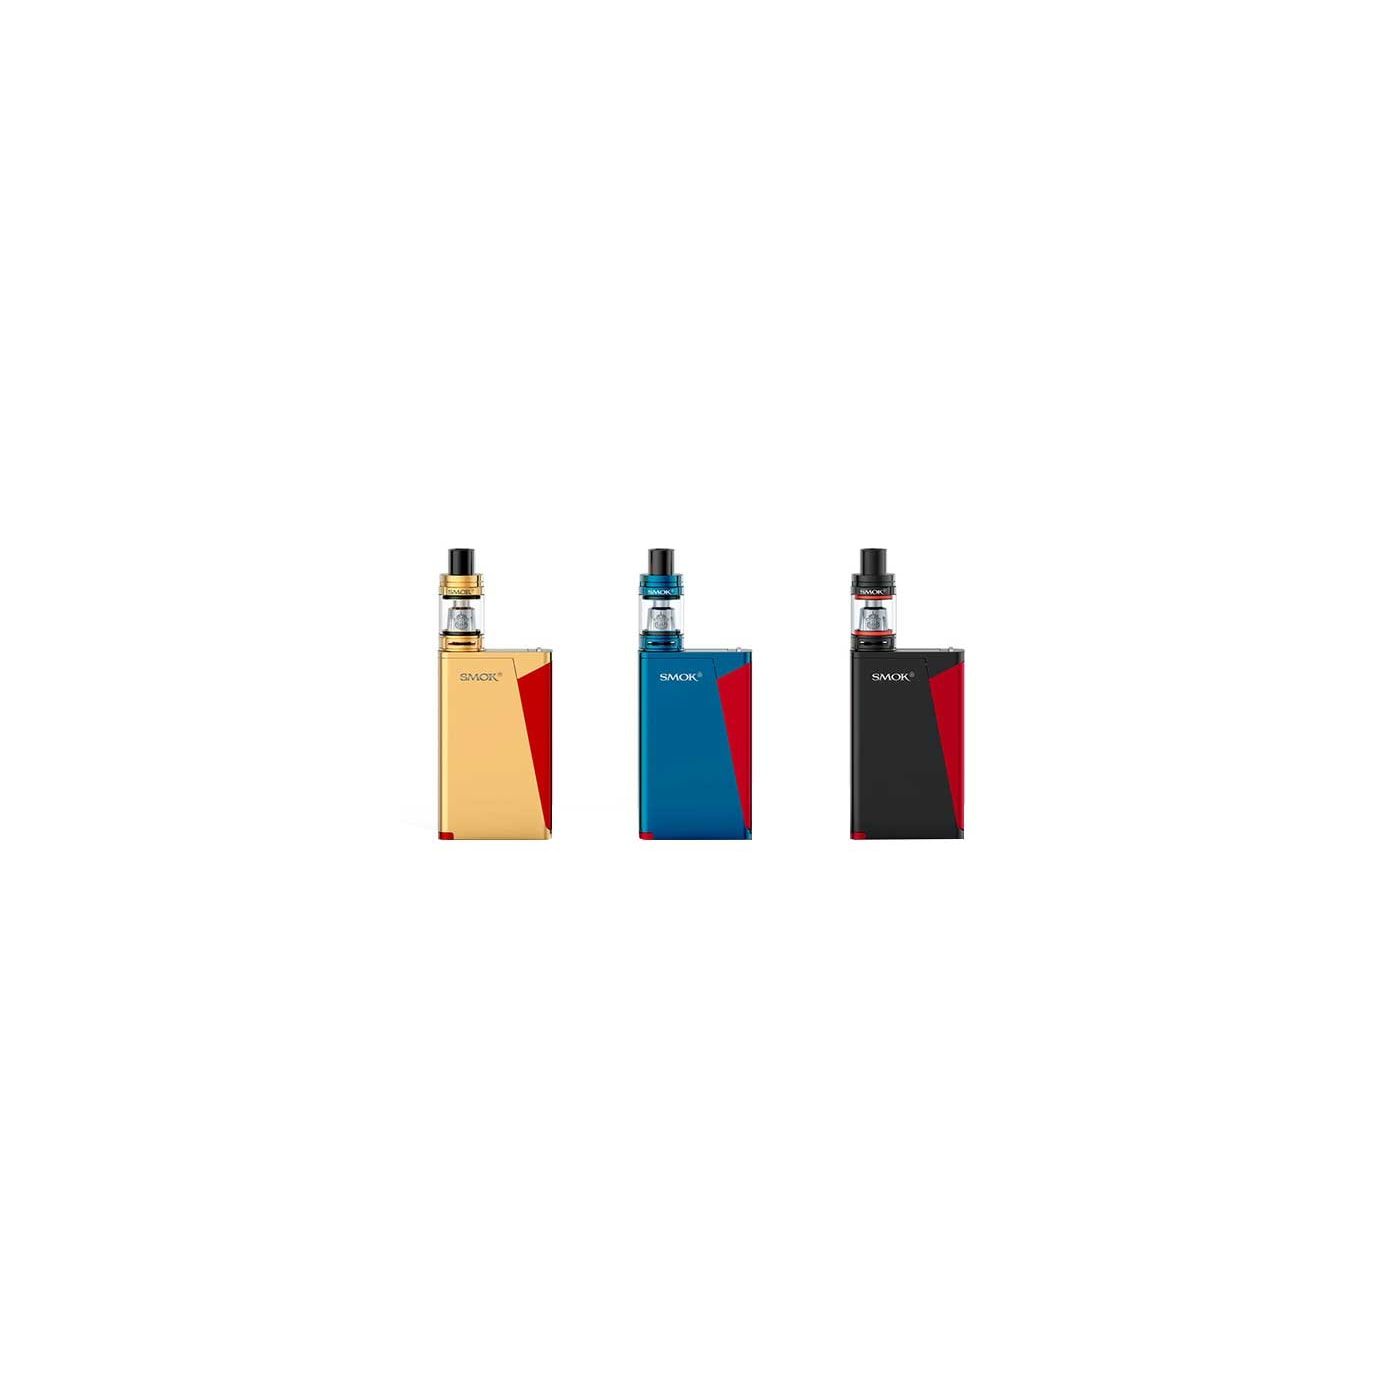 Smok H-Priv Pro 220W TC Box Mod Kit